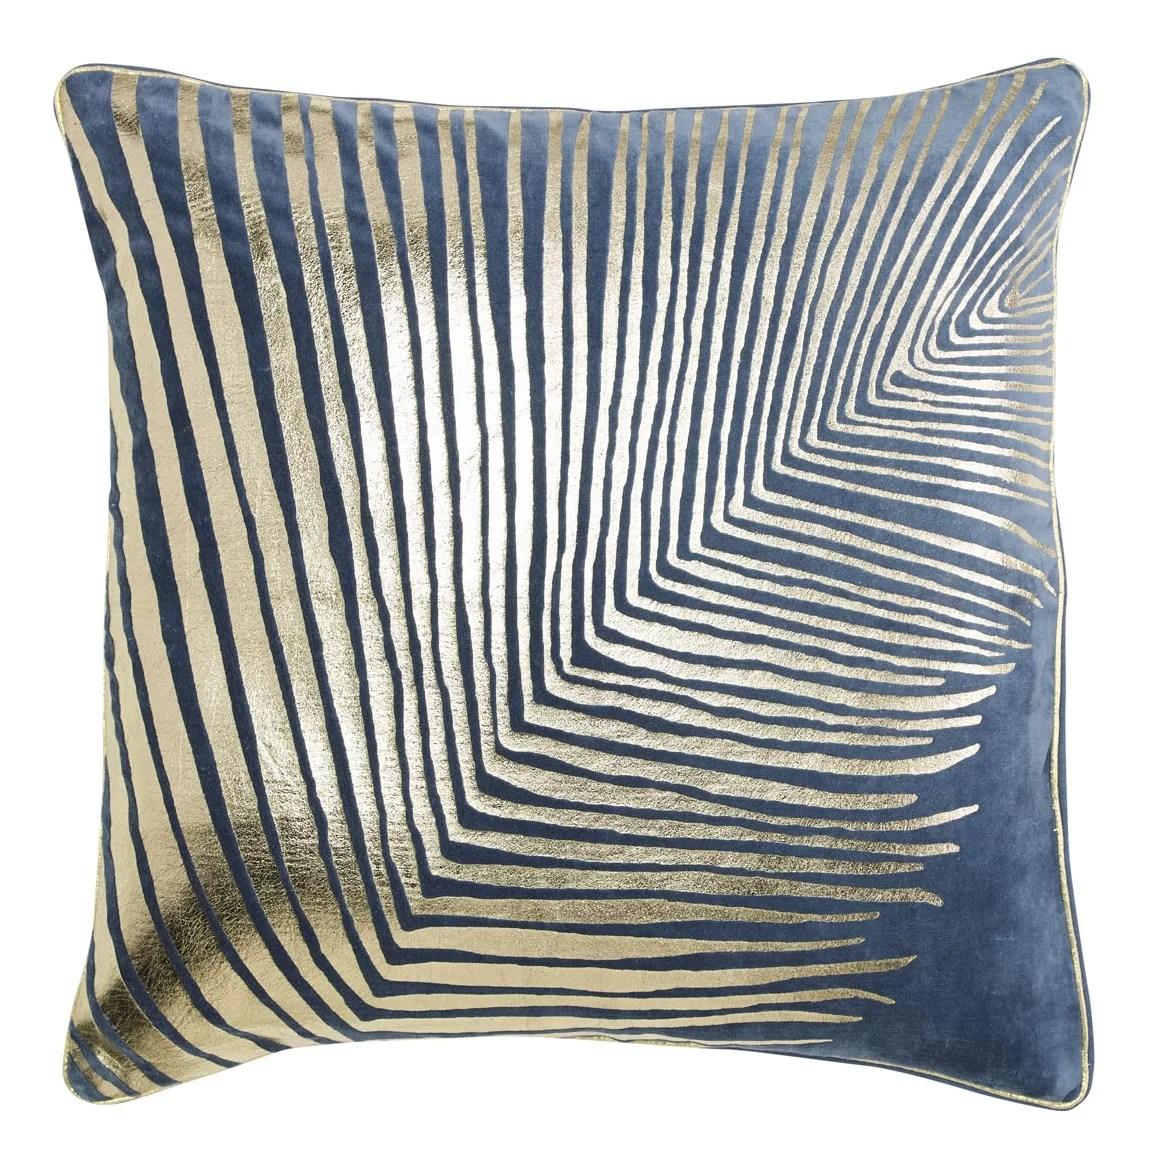 Company C Fanfare Throw Pillow